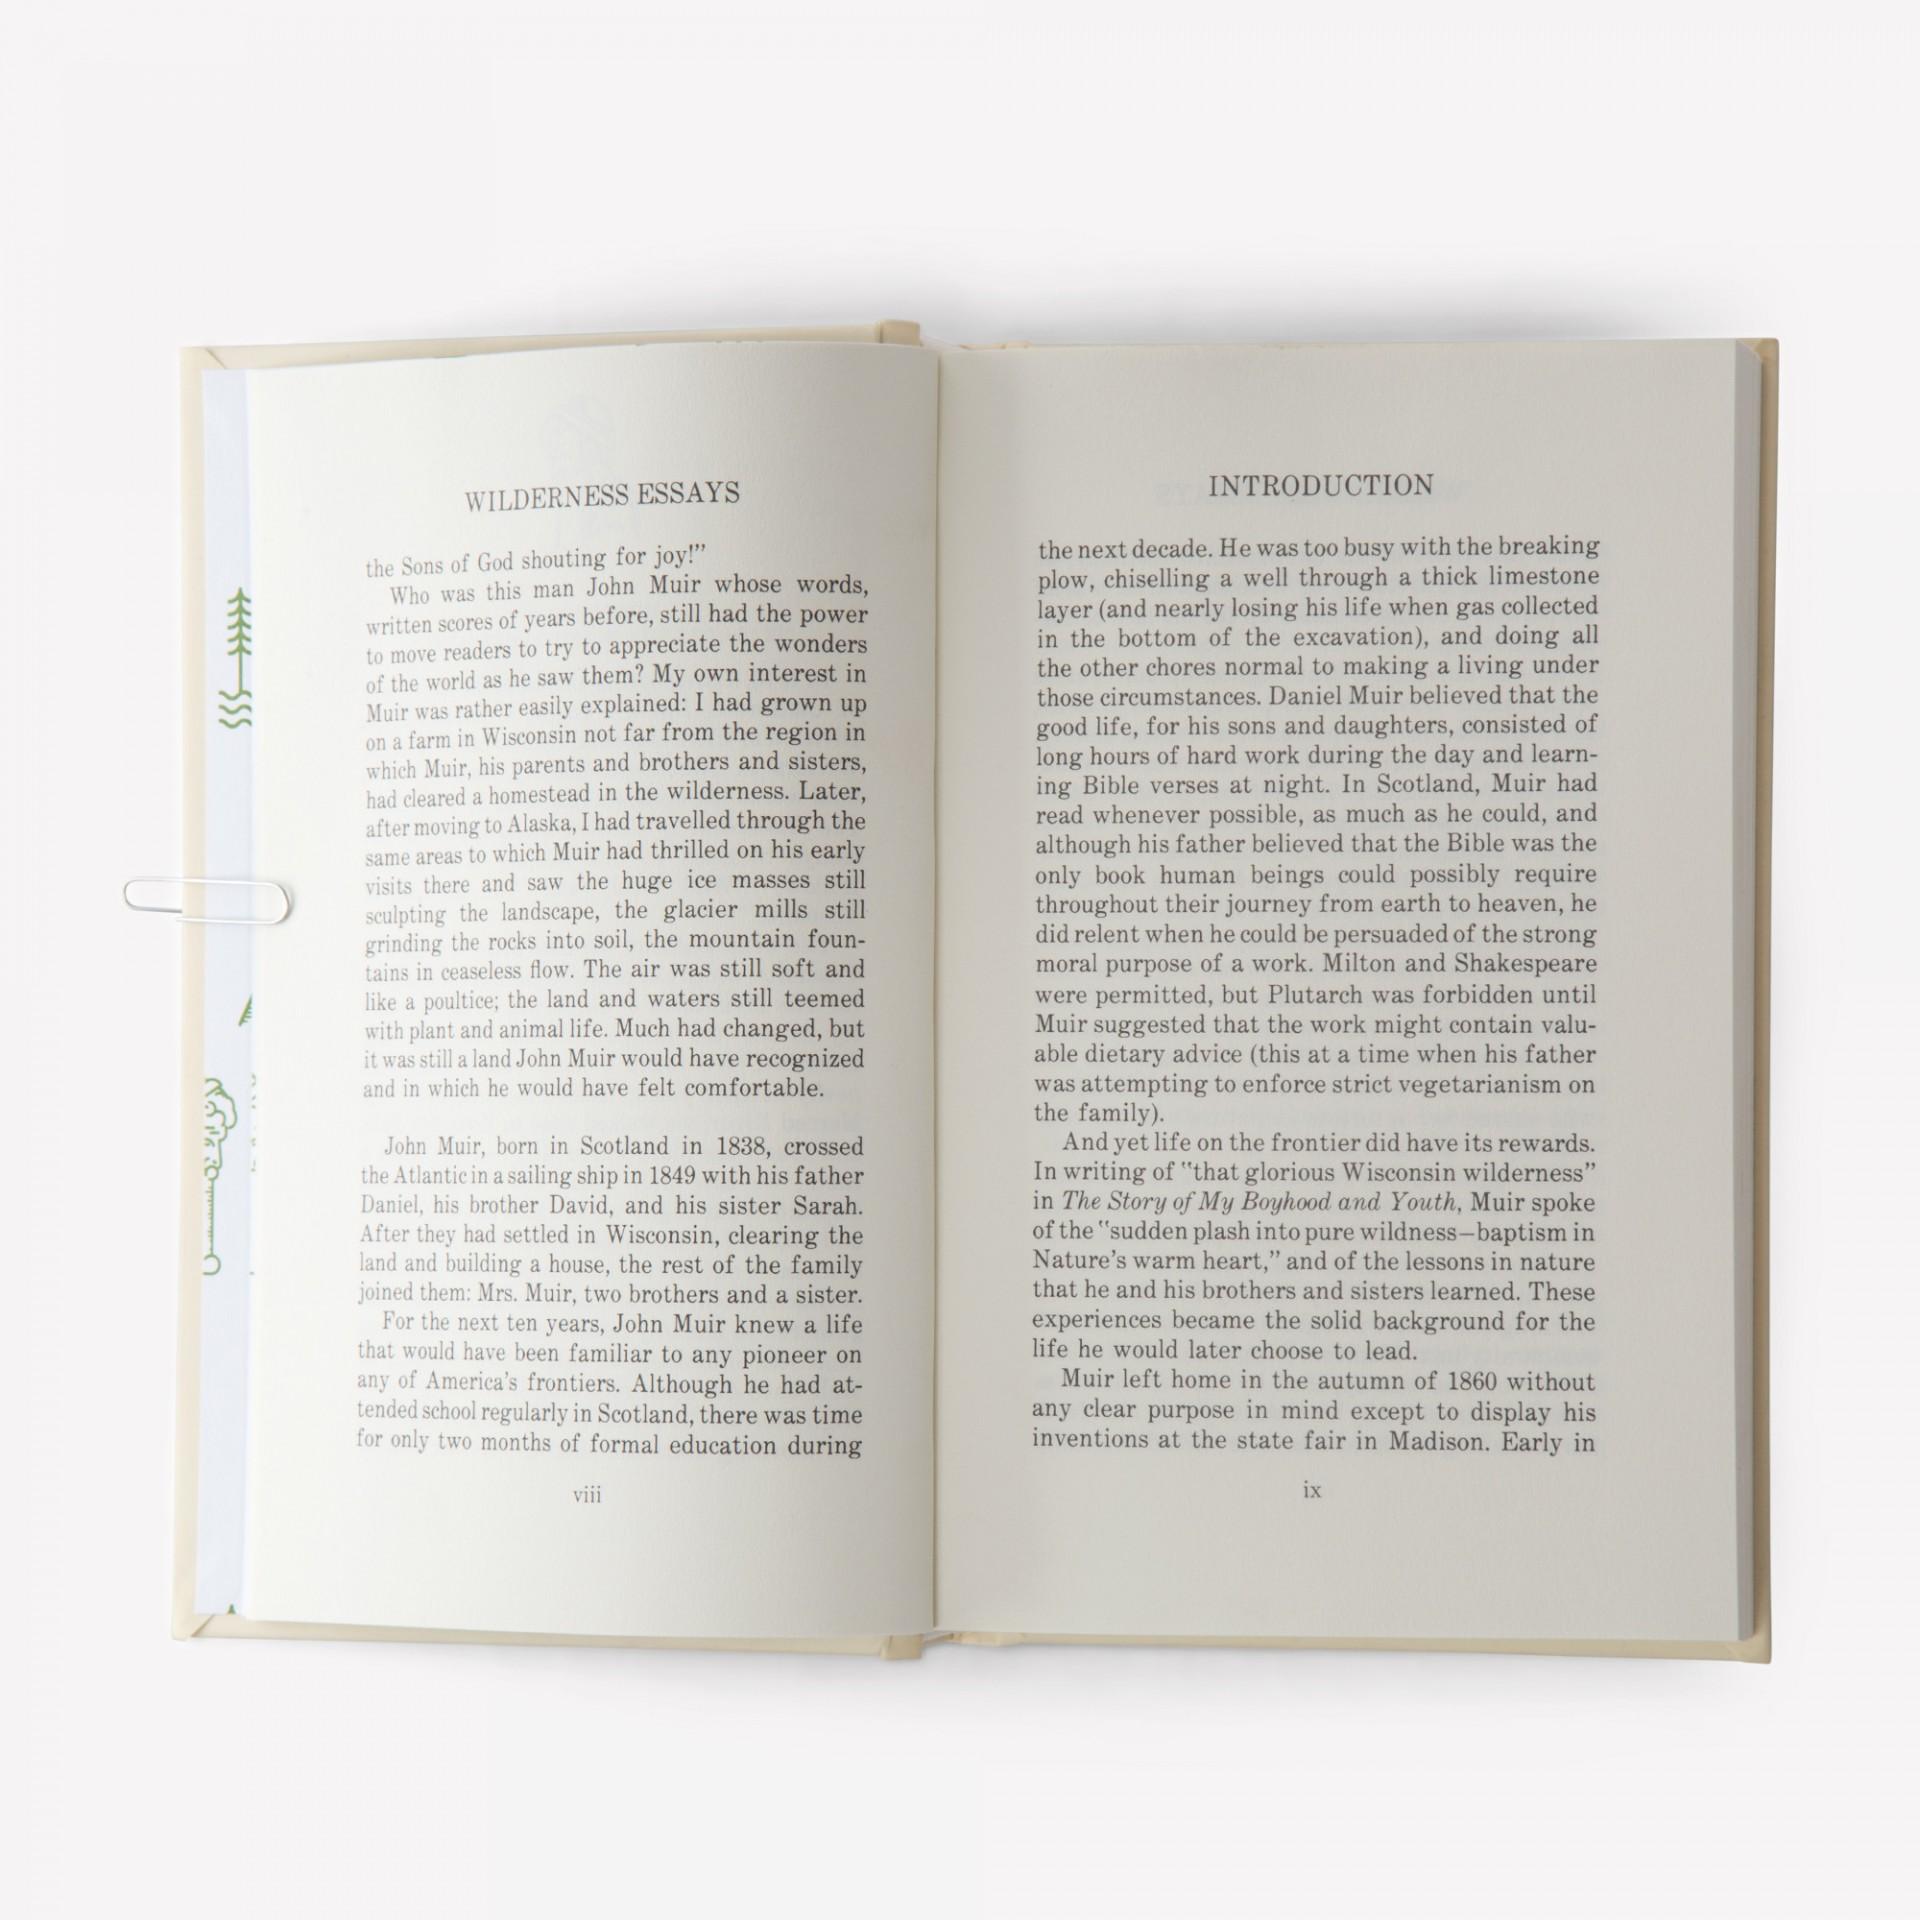 006 Gibbs Smith Wilderness Essays 220deleted201a279c83f634a891b615e39faad09a5bsha2bd0124165b81d12 Essay Example John Best Muir Pdf Review 1920